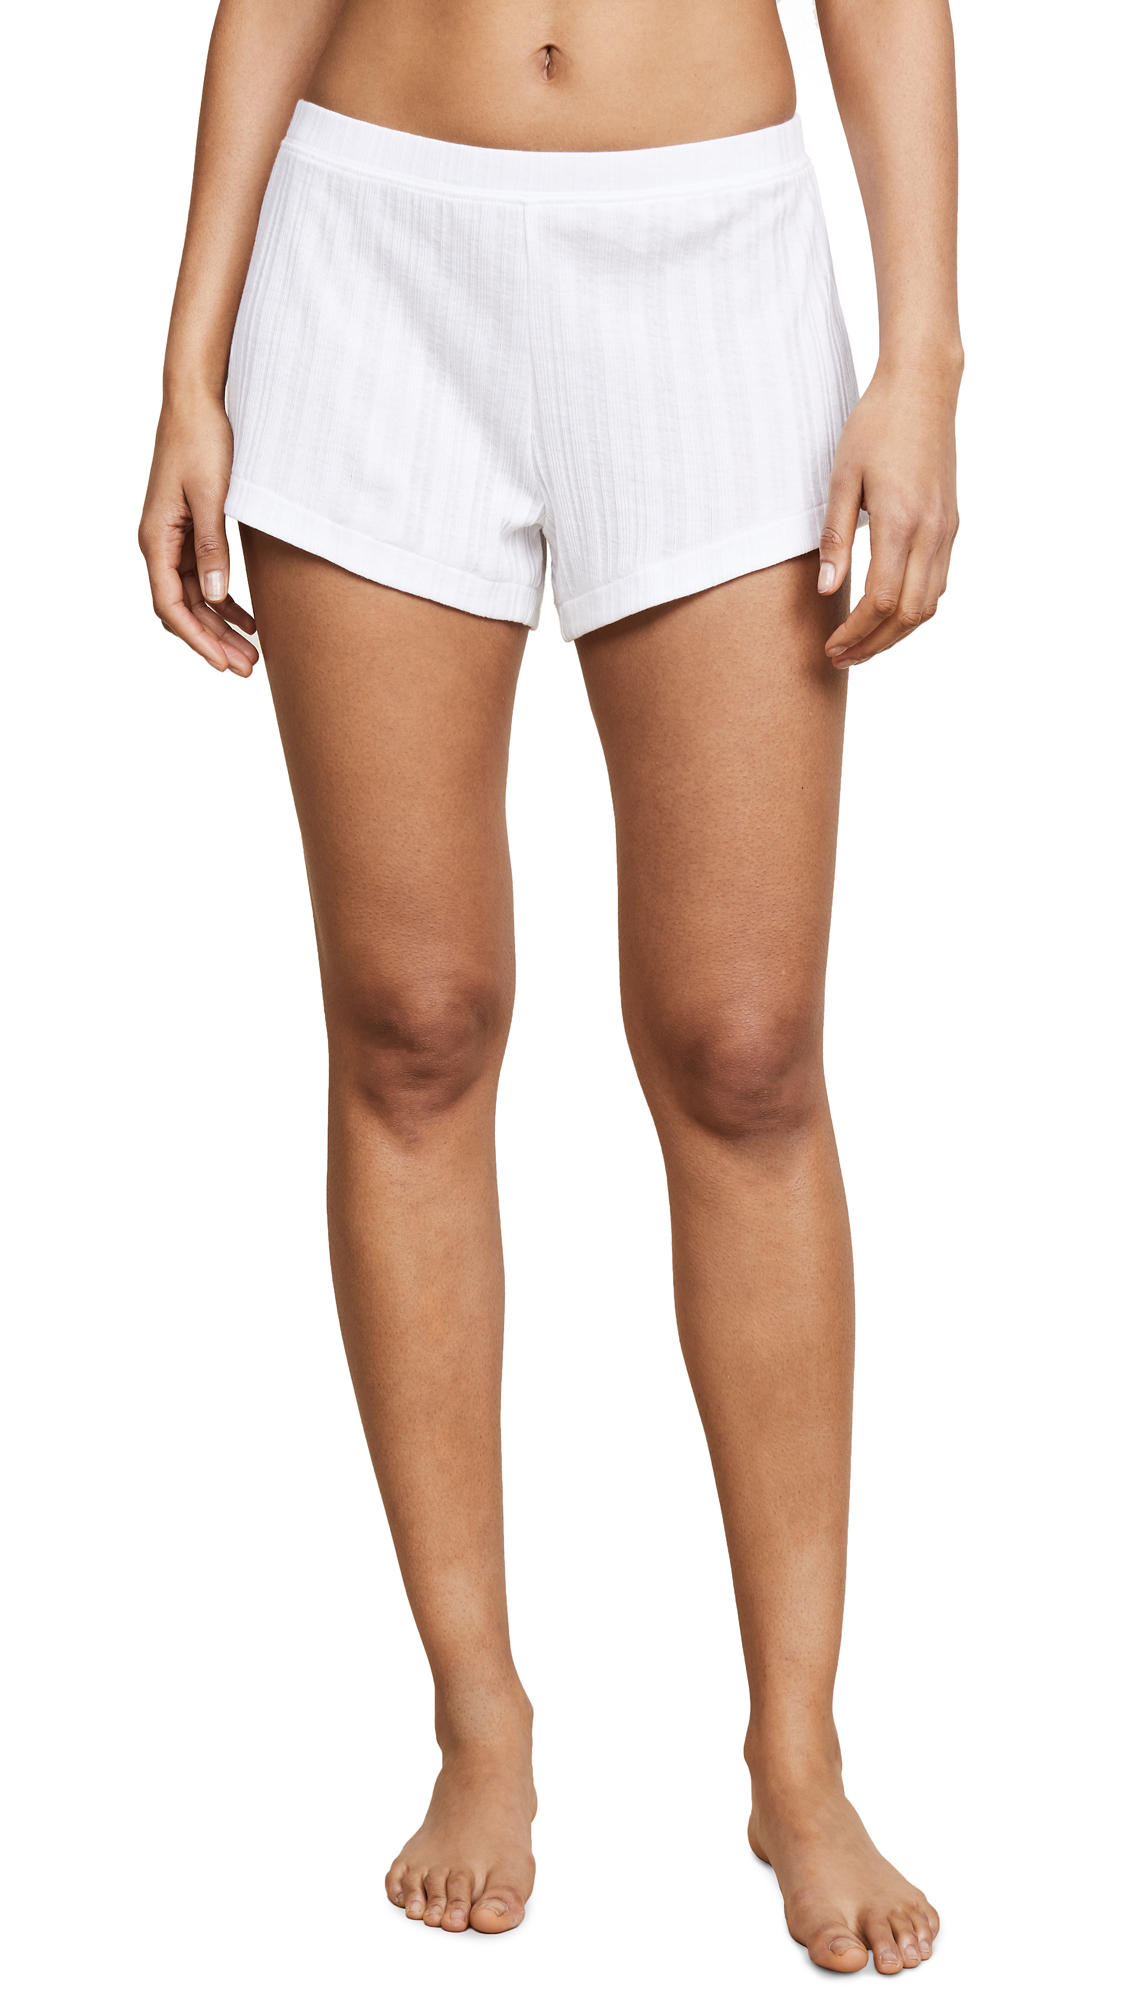 Skin Rooney Shorts In White